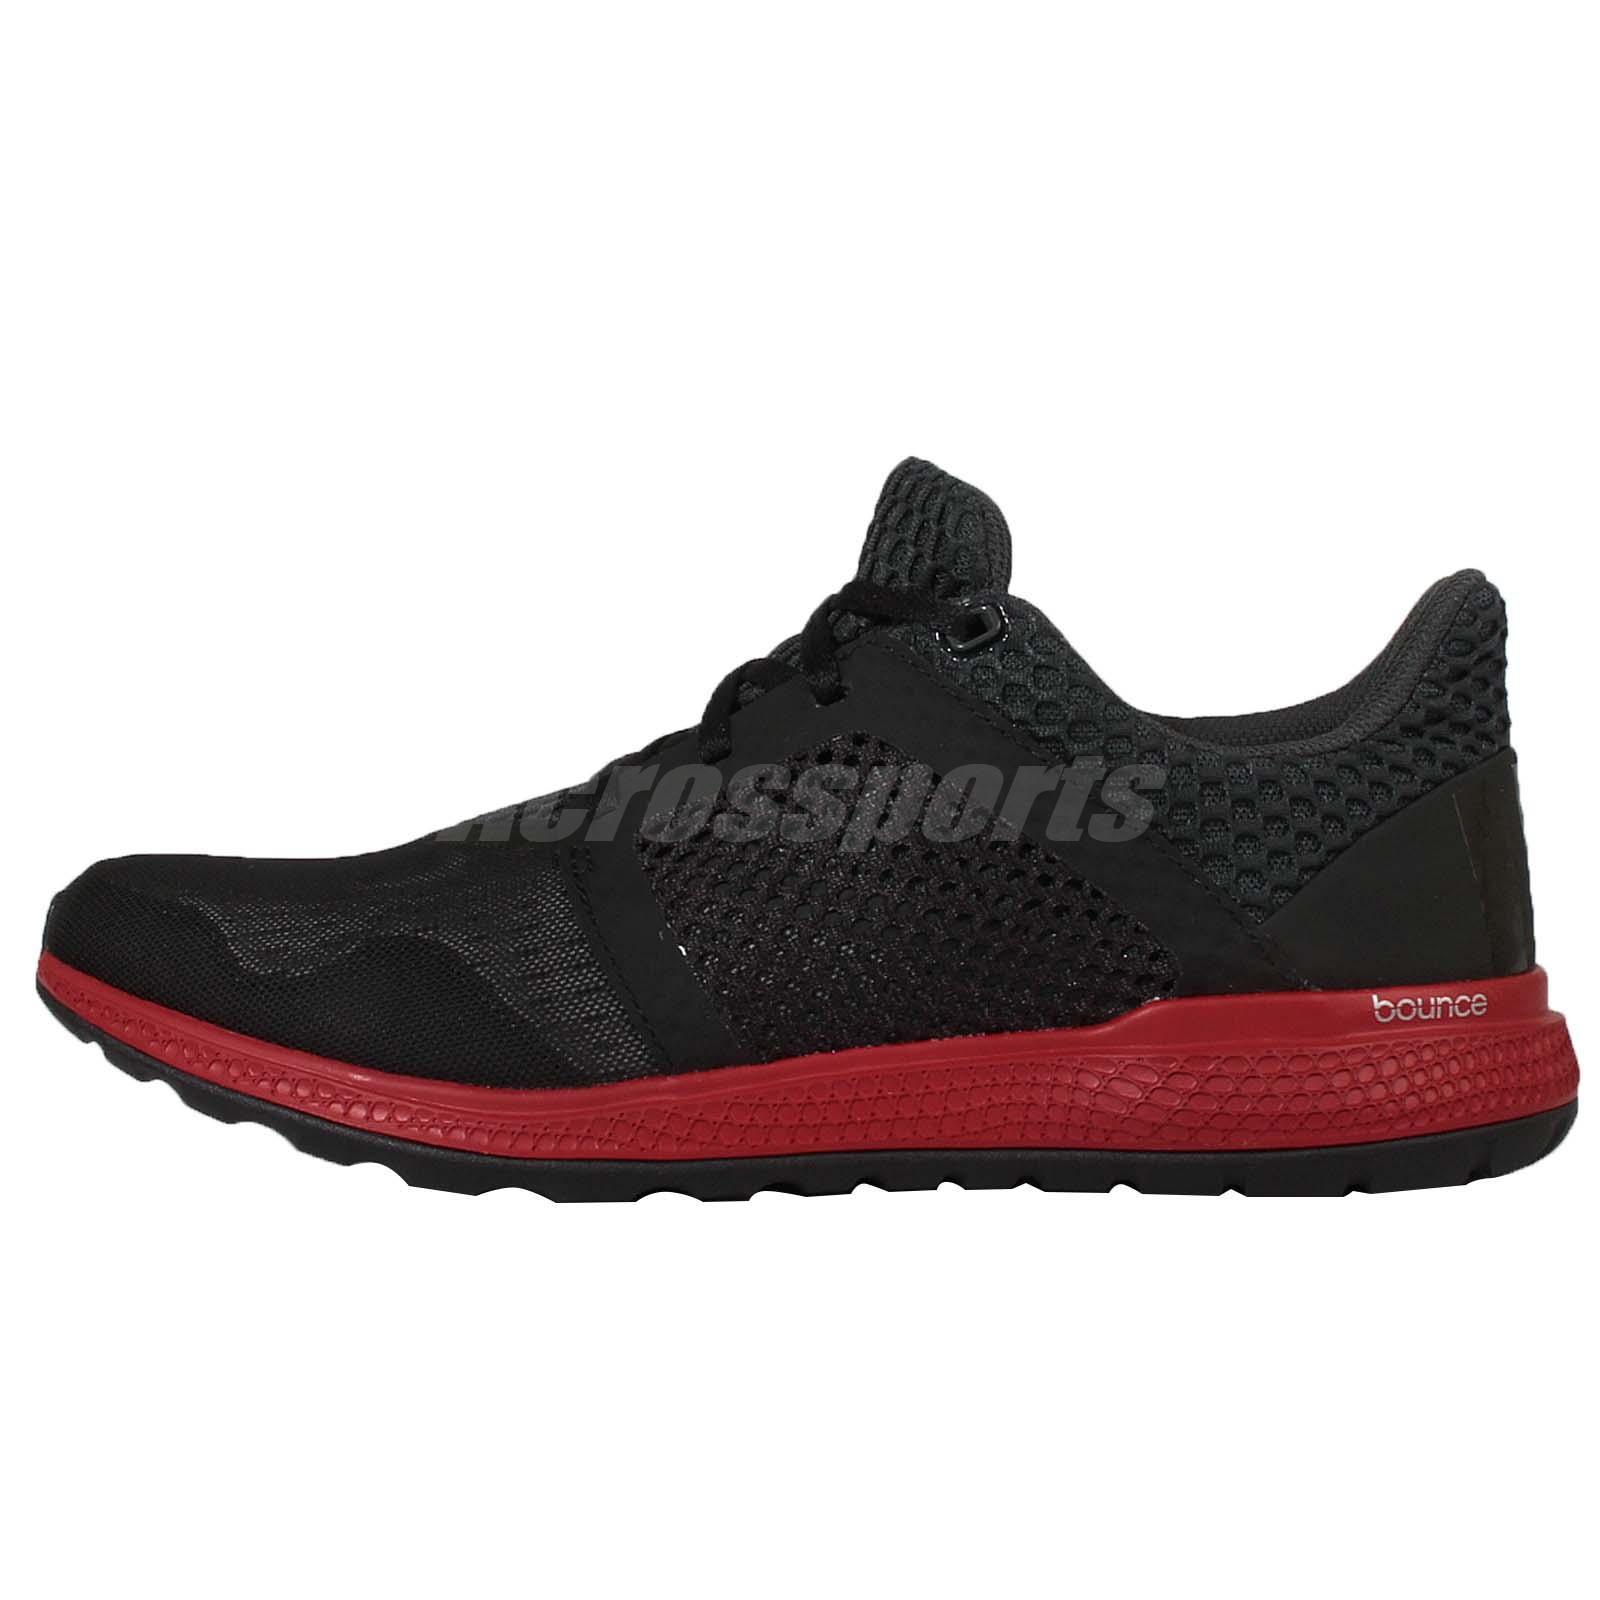 pretty nice b89d9 b0e3d Adidas Womens Energy Boost Running Shoe Review POPSUGAR